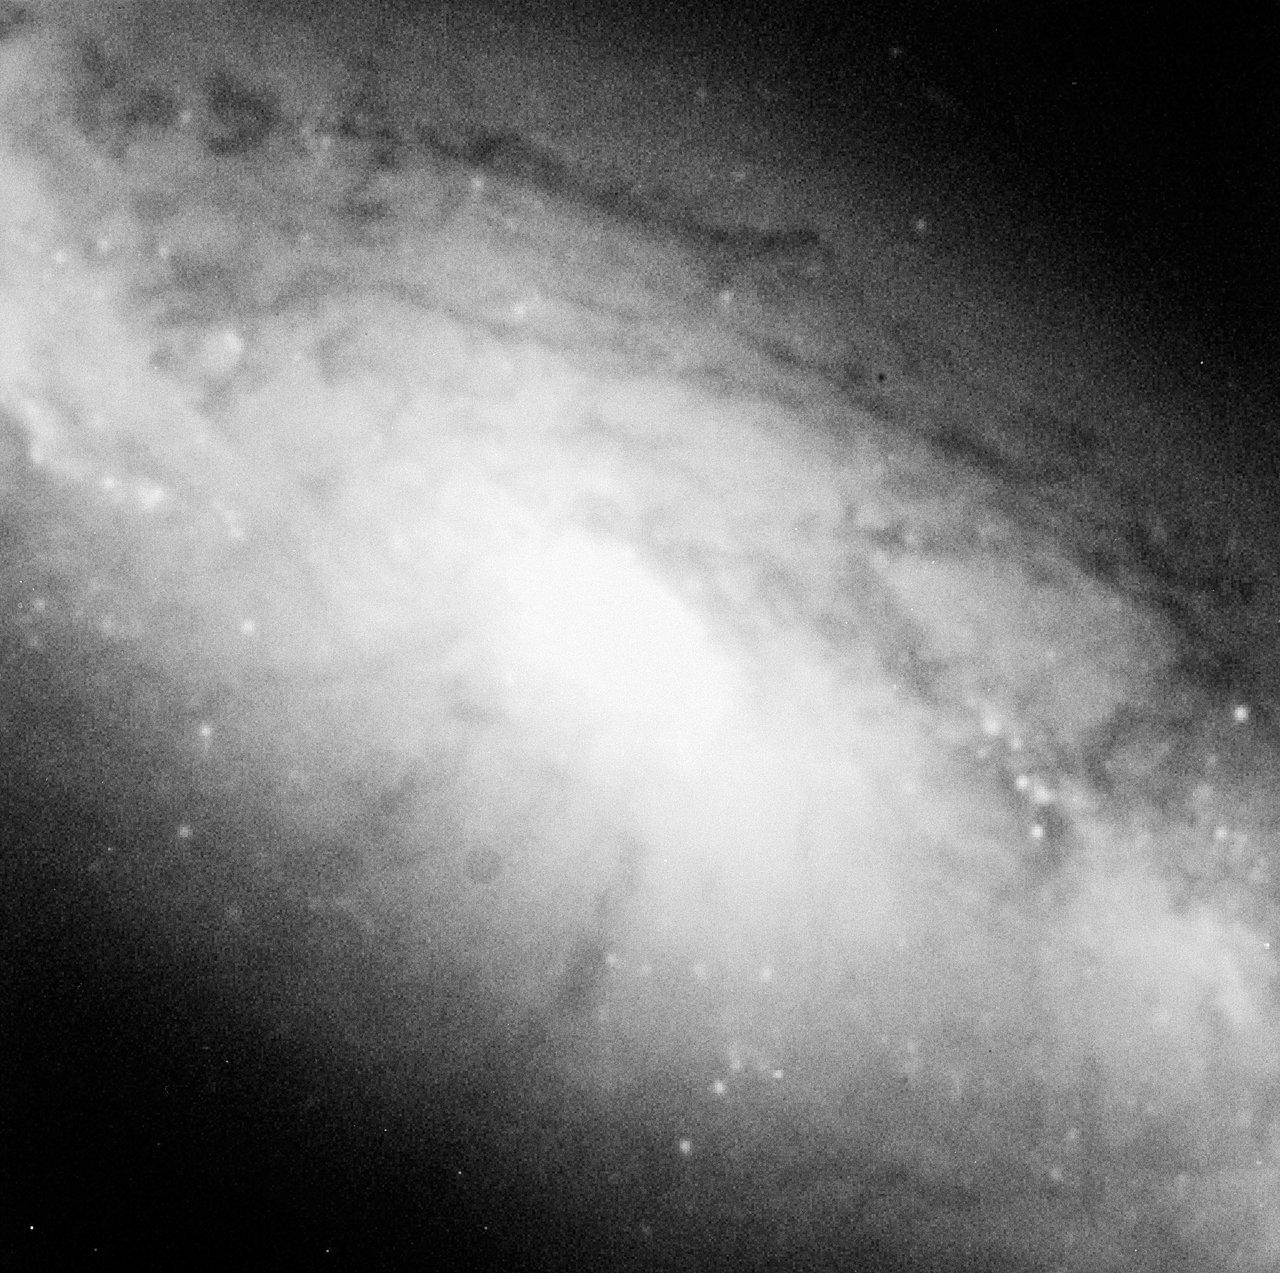 Galaxy NGC 1808